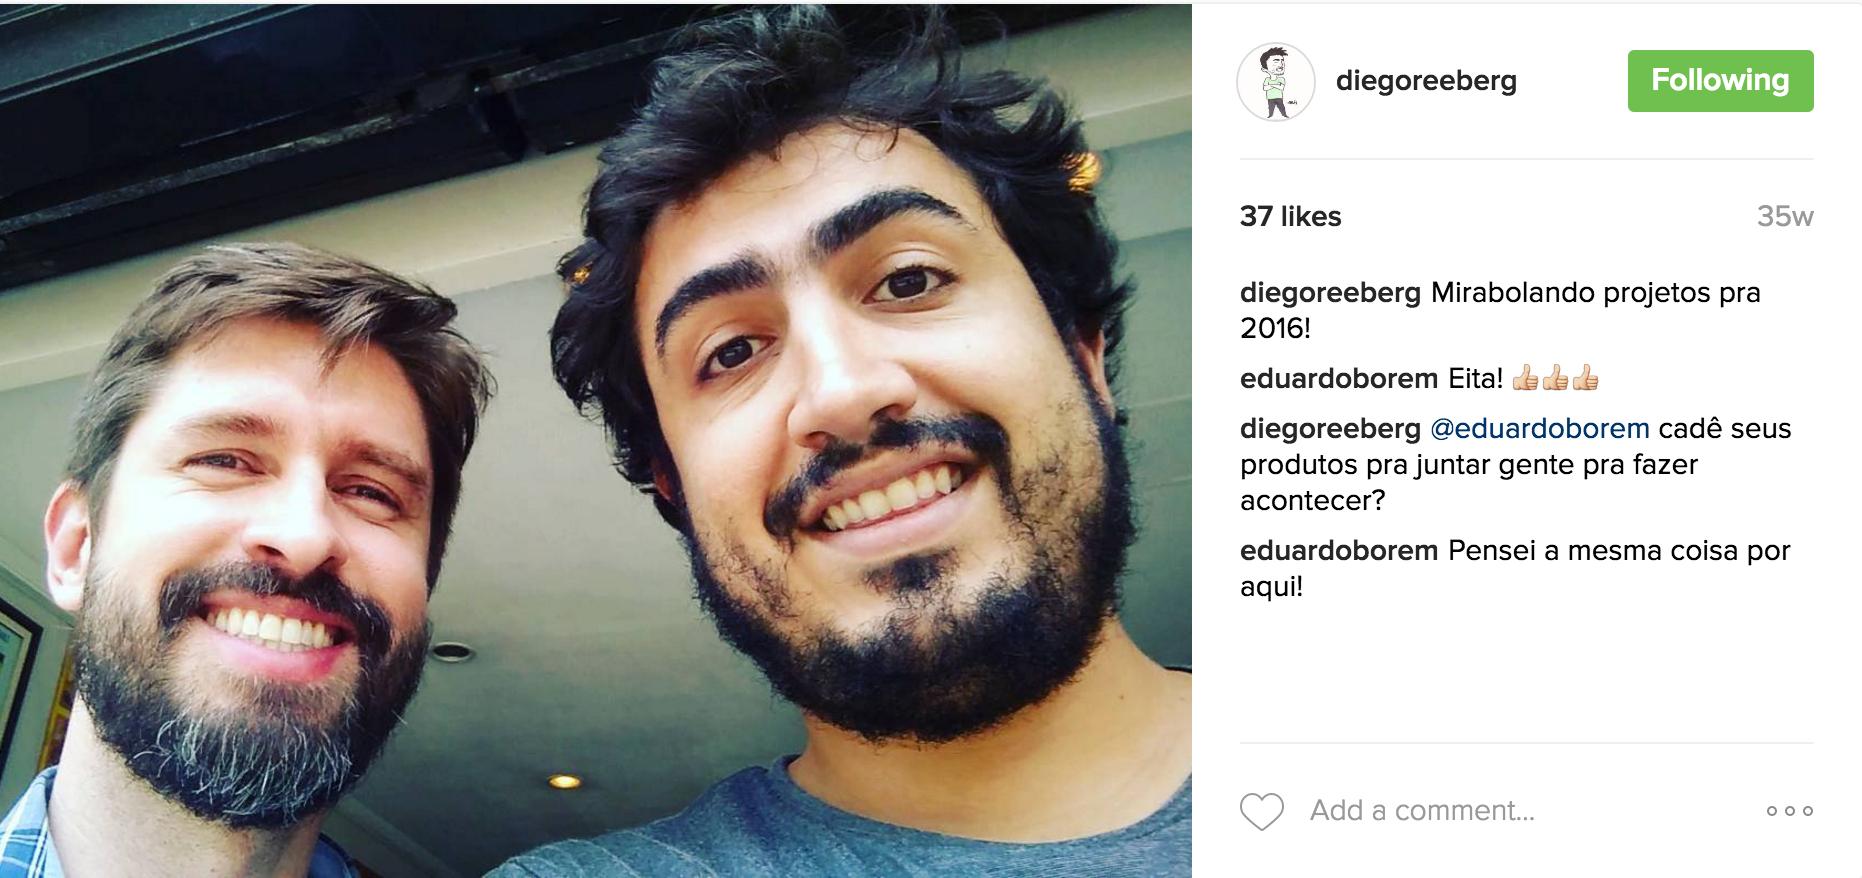 mola Marcio Sequeira Diego Reeberg  catarse